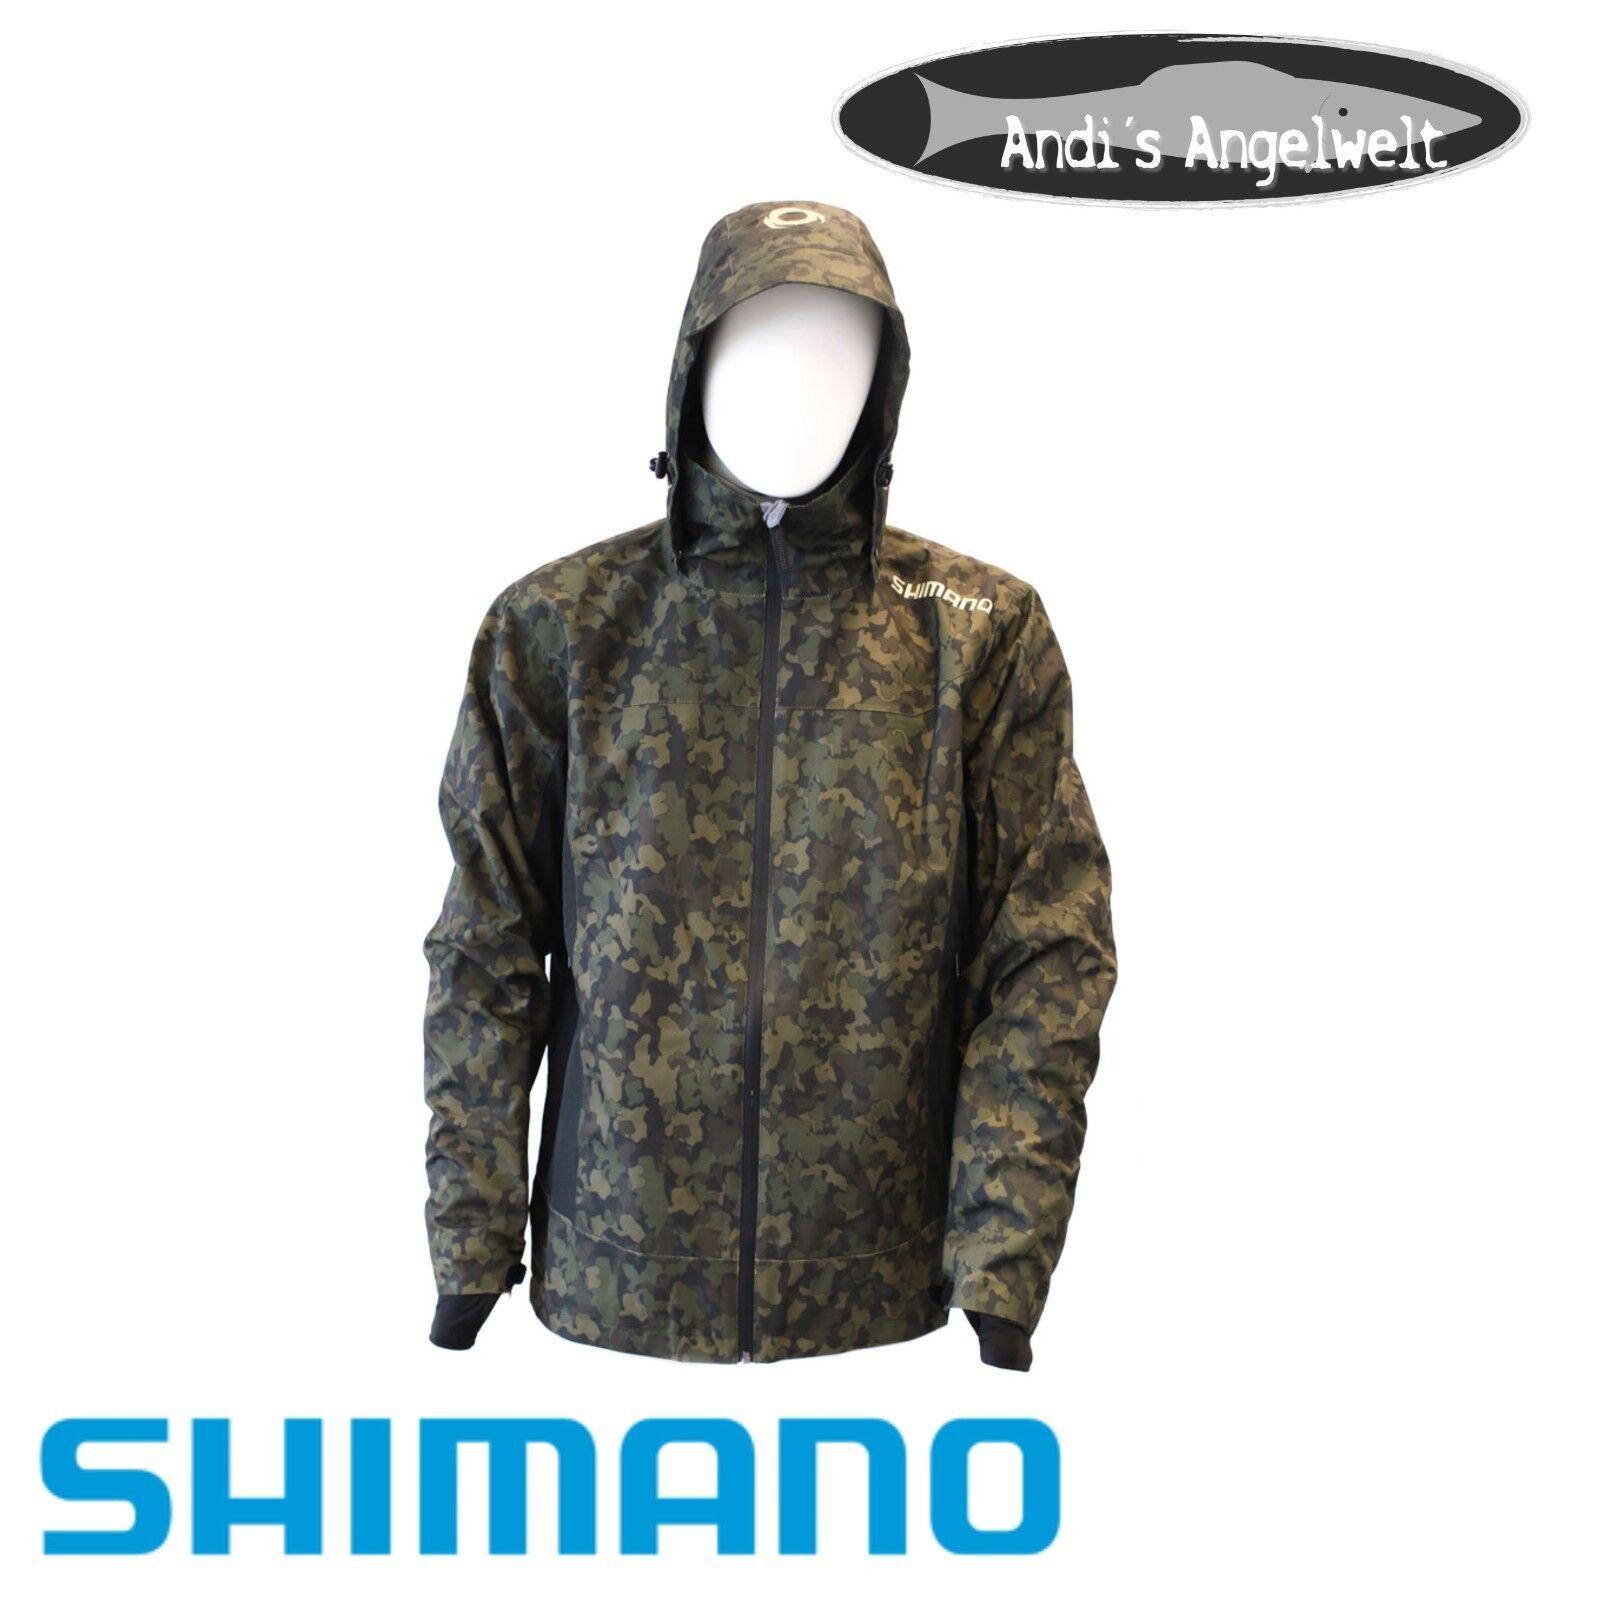 Shimano Tribal XTR Giacca di transizione giacca pioggia-Giacca-M L XL XXL 3xl